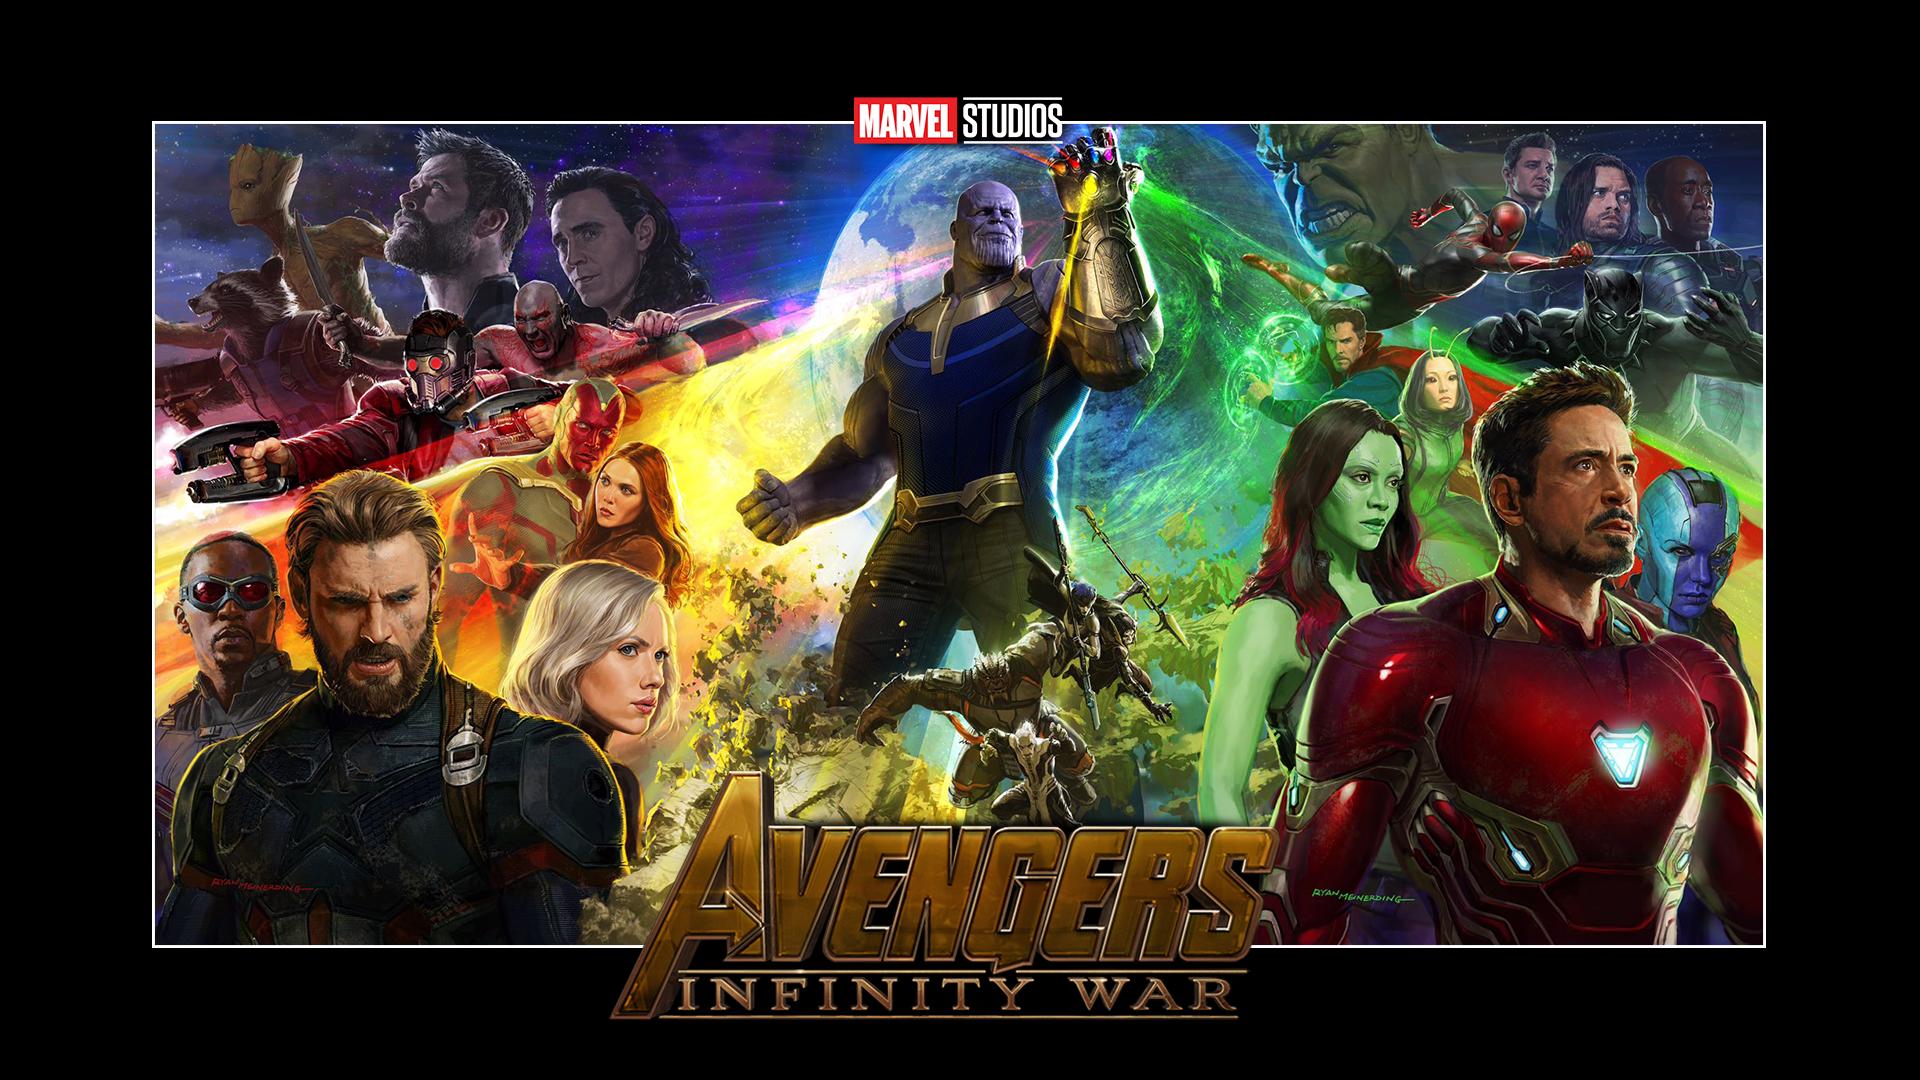 10 New Avengers Infinity War Desktop Wallpaper Full Hd: Fondos De Los Vengadores Infinity War, Wallpapers Avengers